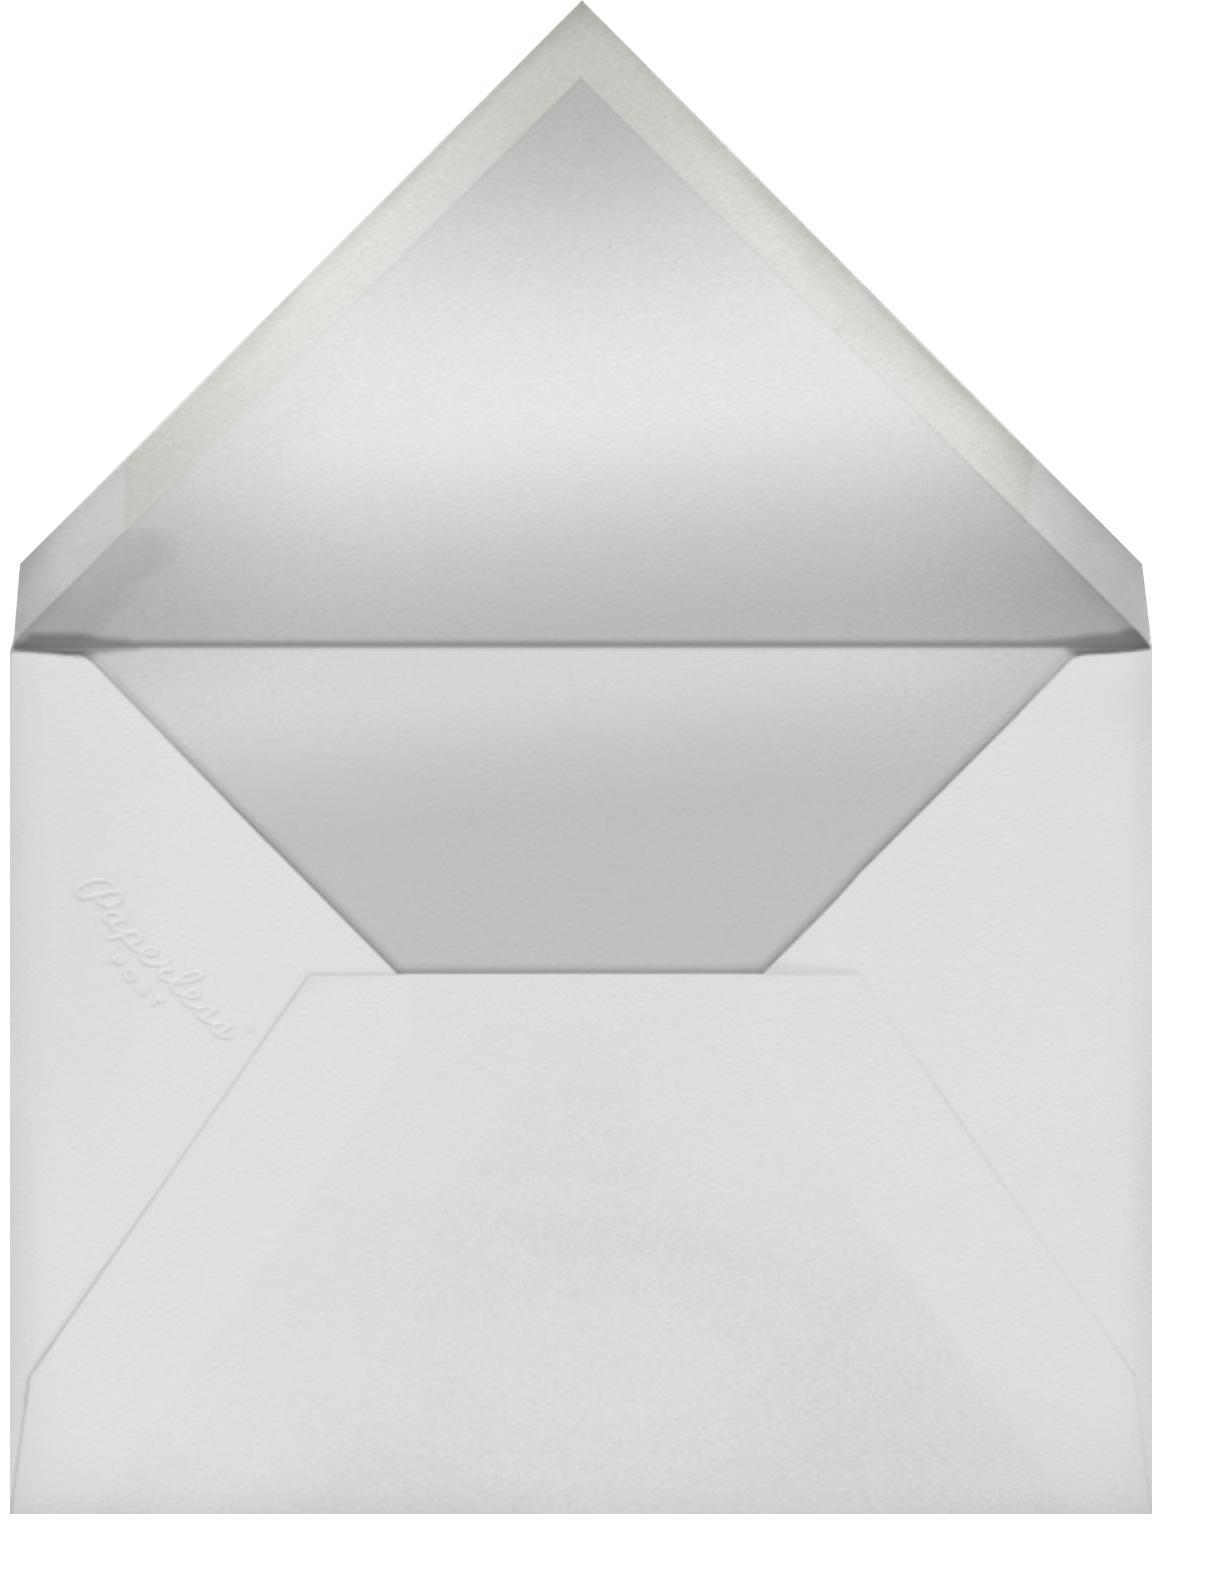 Confetti (Program) - White/Rose Gold - kate spade new york - Menus and programs - envelope back